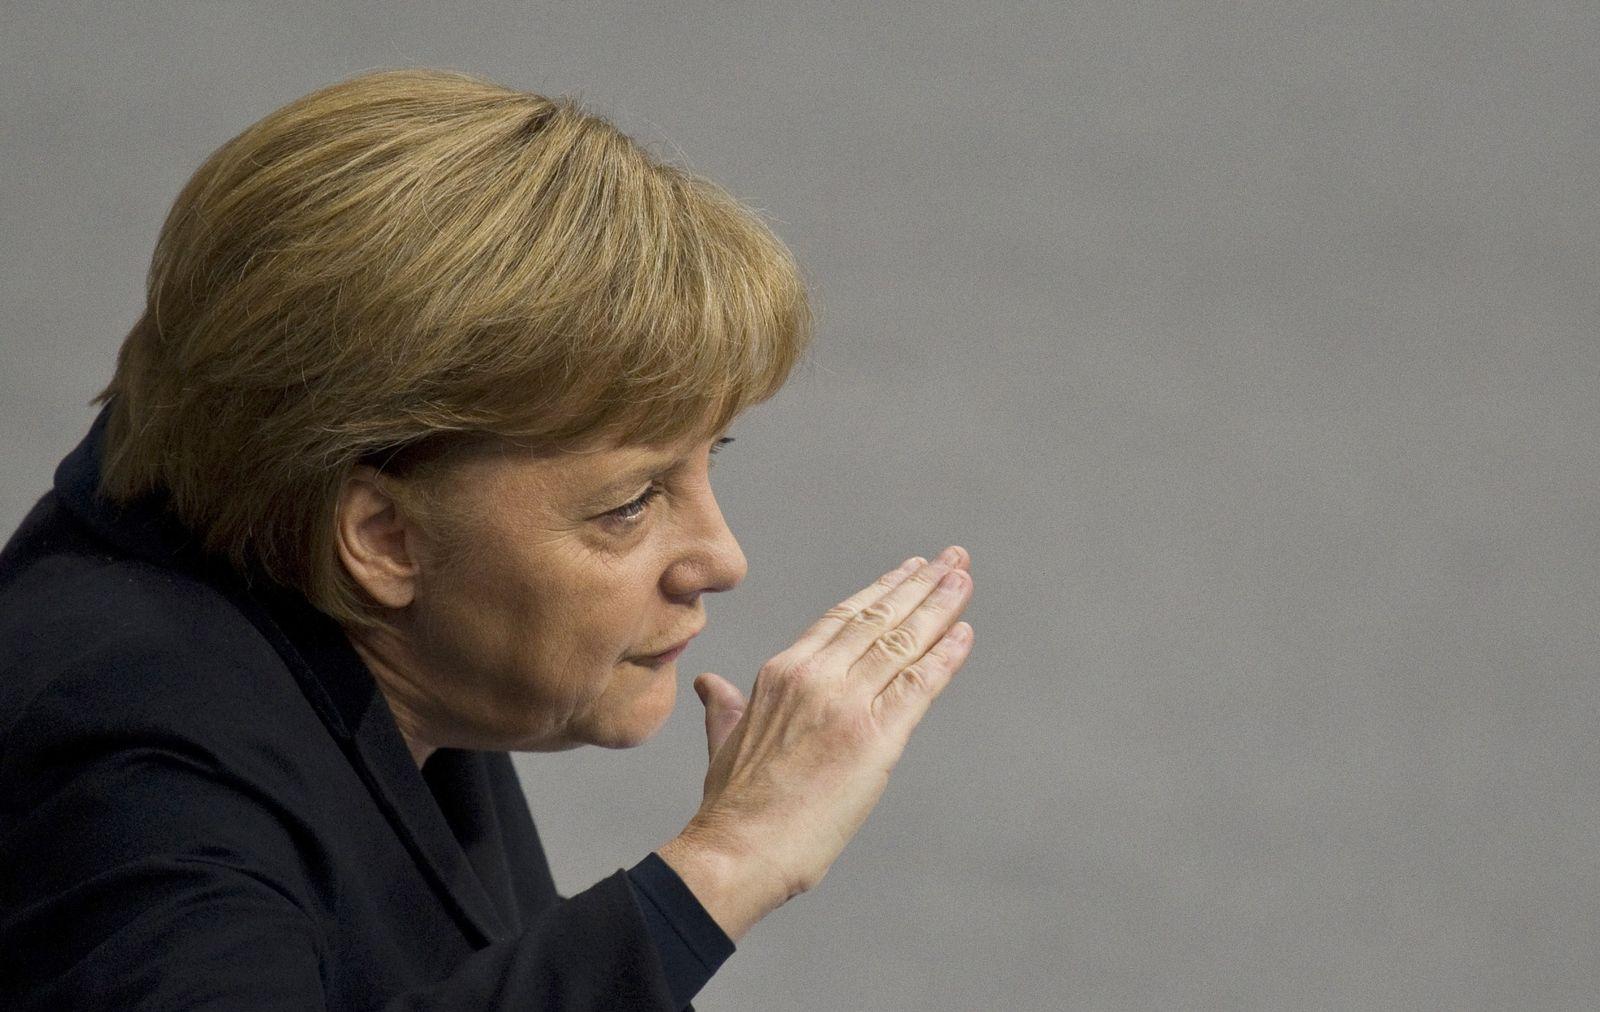 GERMANY-POLITICS-FINANCE-ECONOMY-PUBLIC-DEBT-GREECE-MERKEL